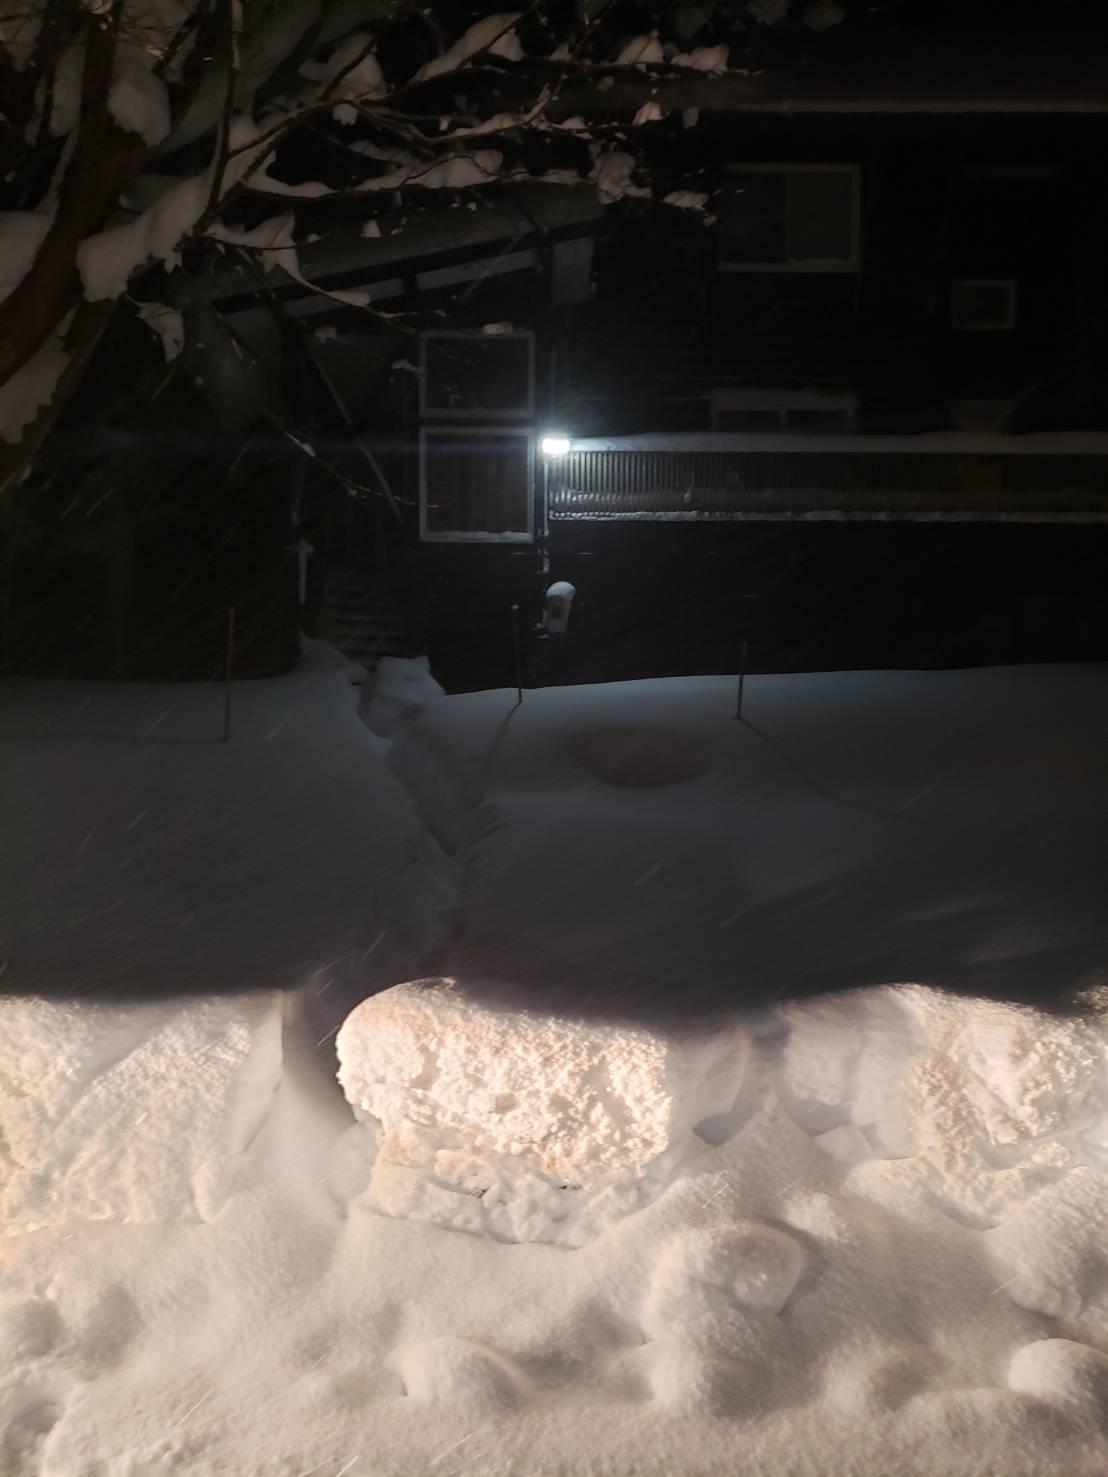 2020年12月19日 南信地域の除雪1